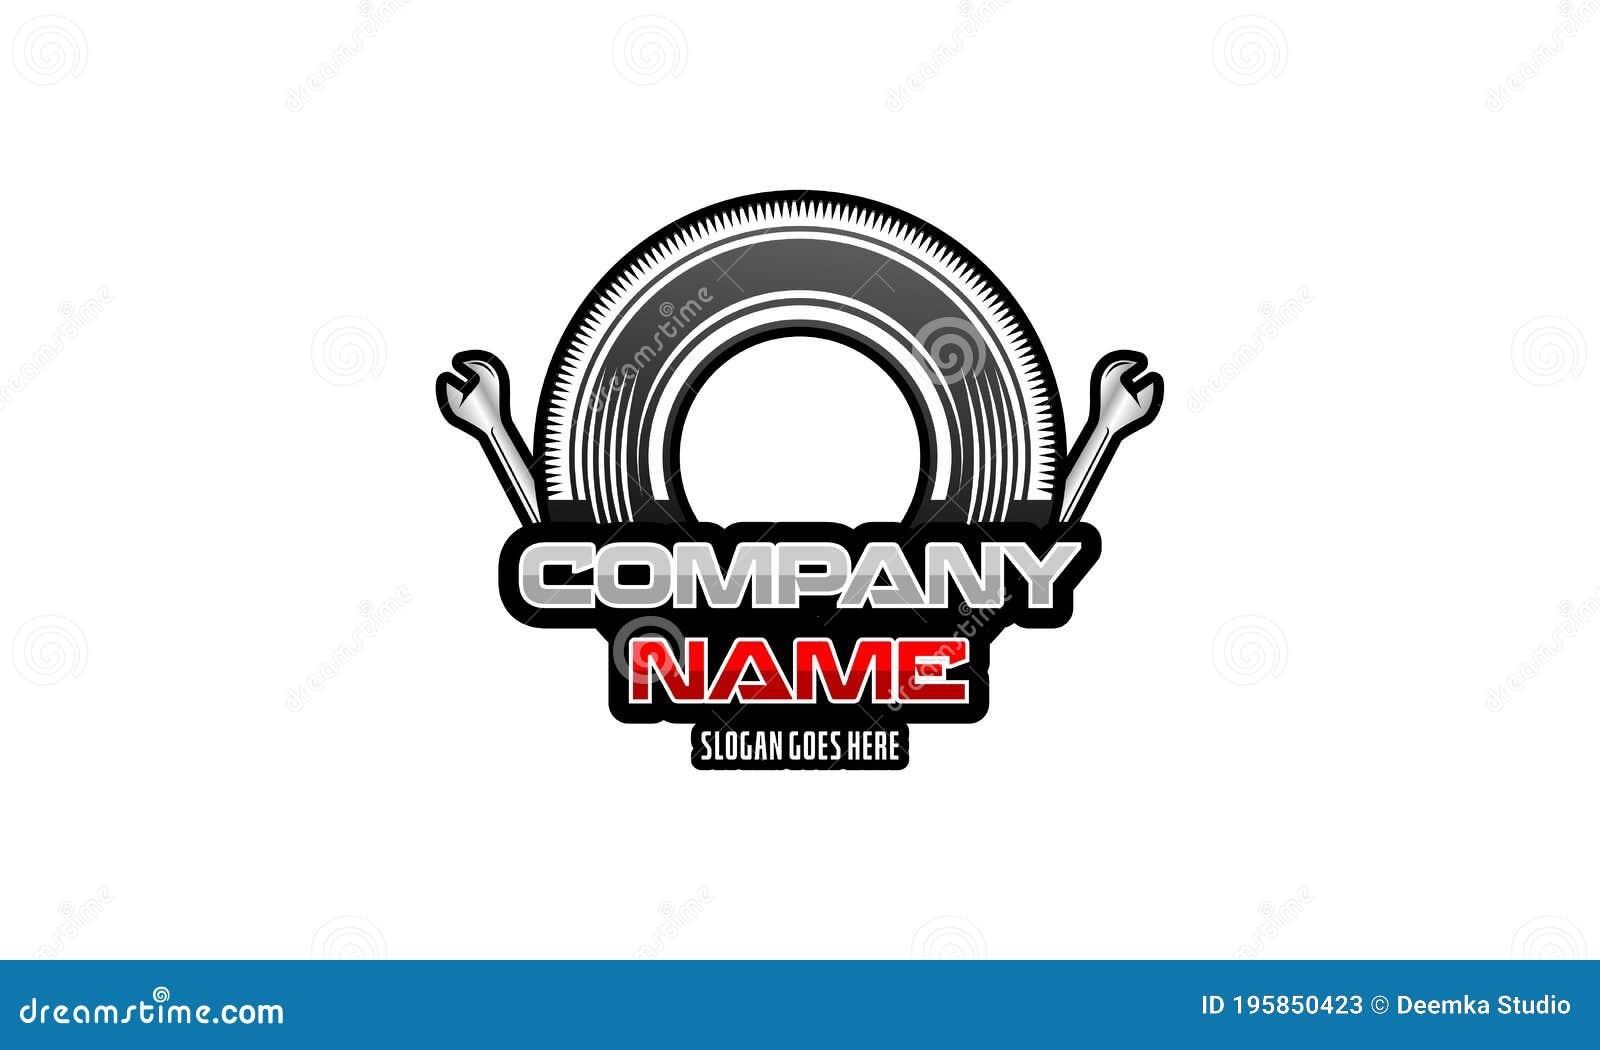 Auto Repair Services Automotive Logo Ideas Sample Vehicle Logos Stock Illustration Illustration Of Fast Branding 195850423